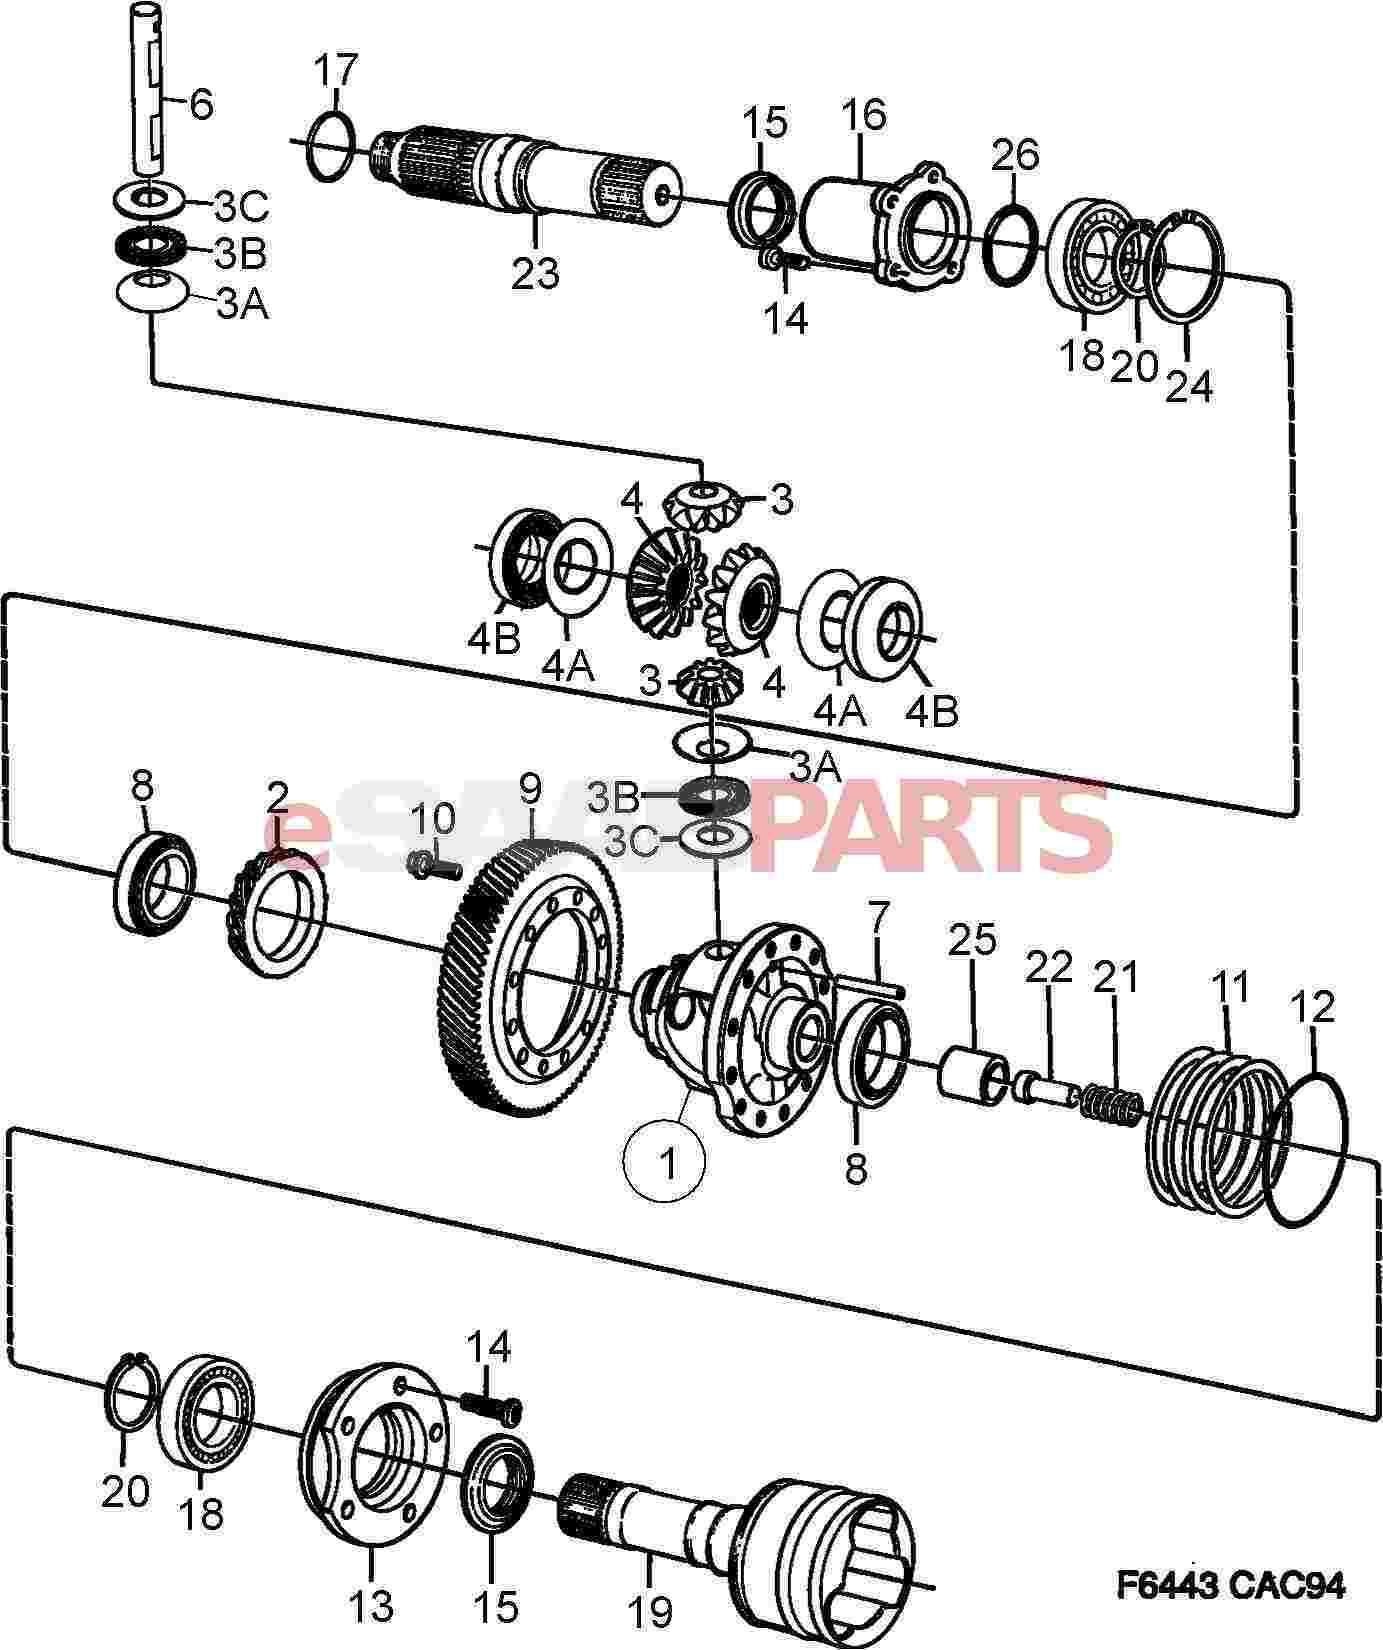 1998 saab 9000 manual transmission hub replacement